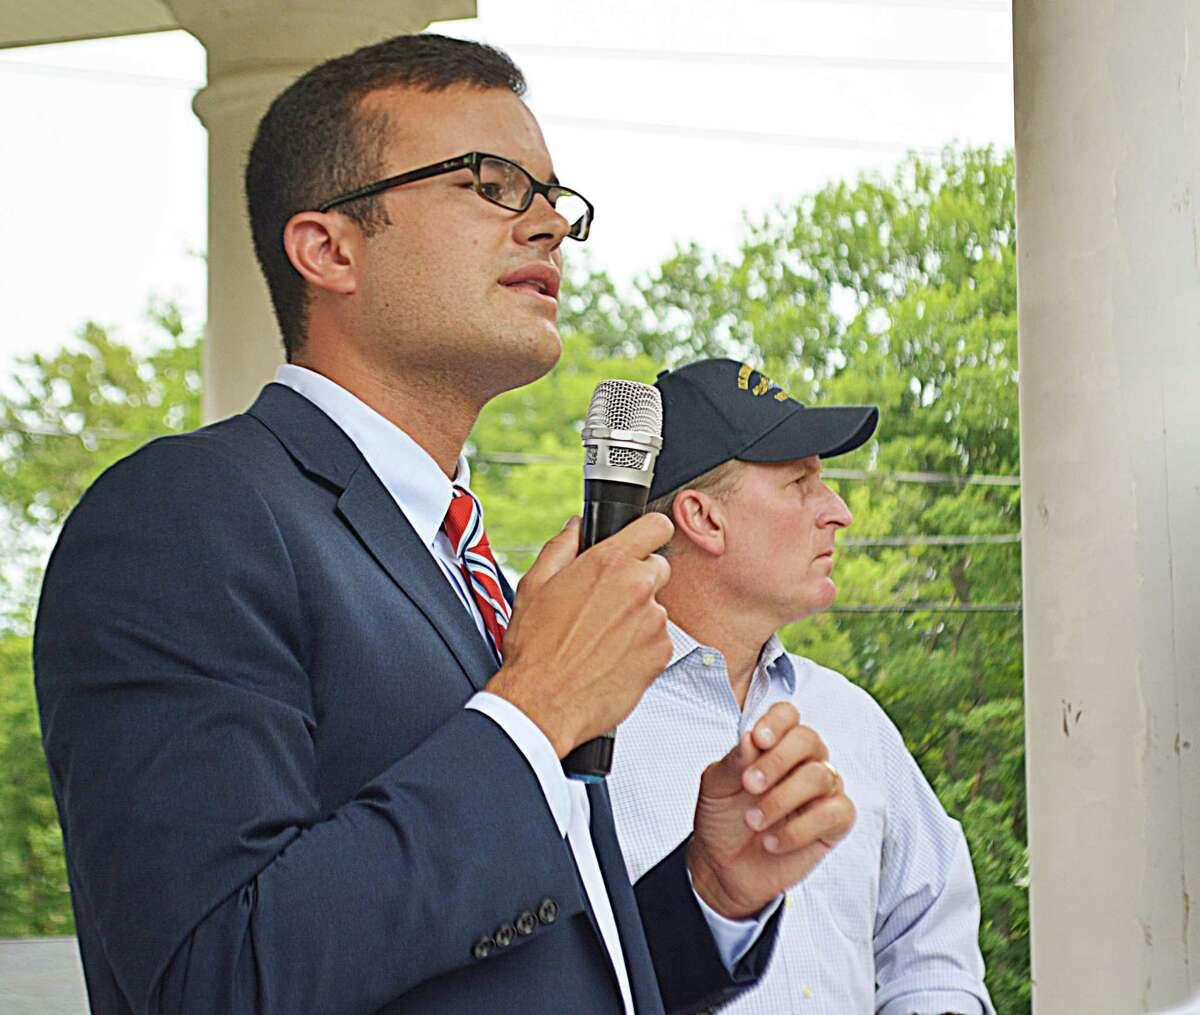 State Sen. Art Linares showed up at the flag rally Monday night at the Higganum Green.